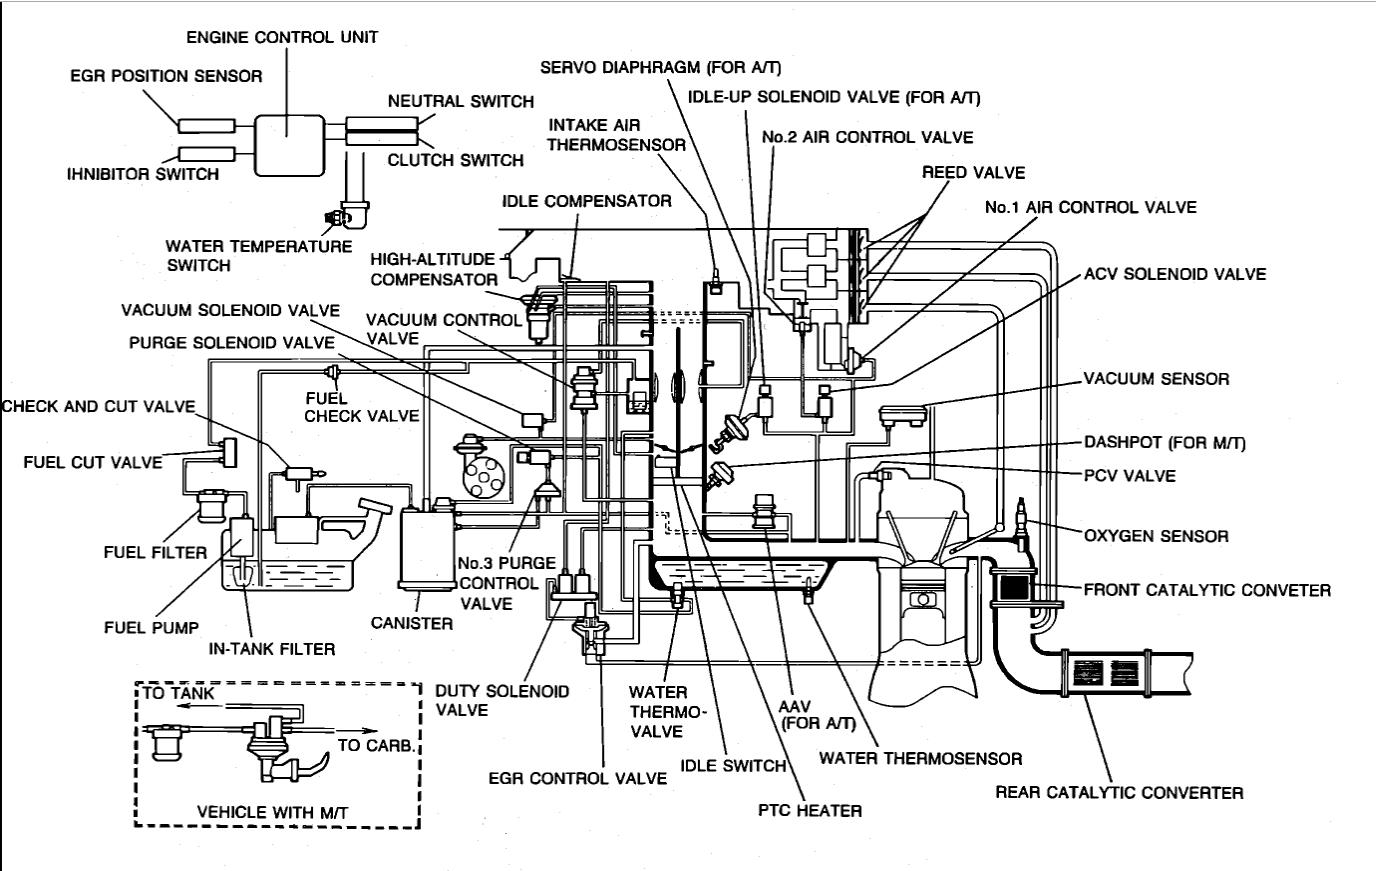 2001 Impala Radio Wiring Diagram On Popscreen Online 2006 Chevy Silverado 2500hd Library